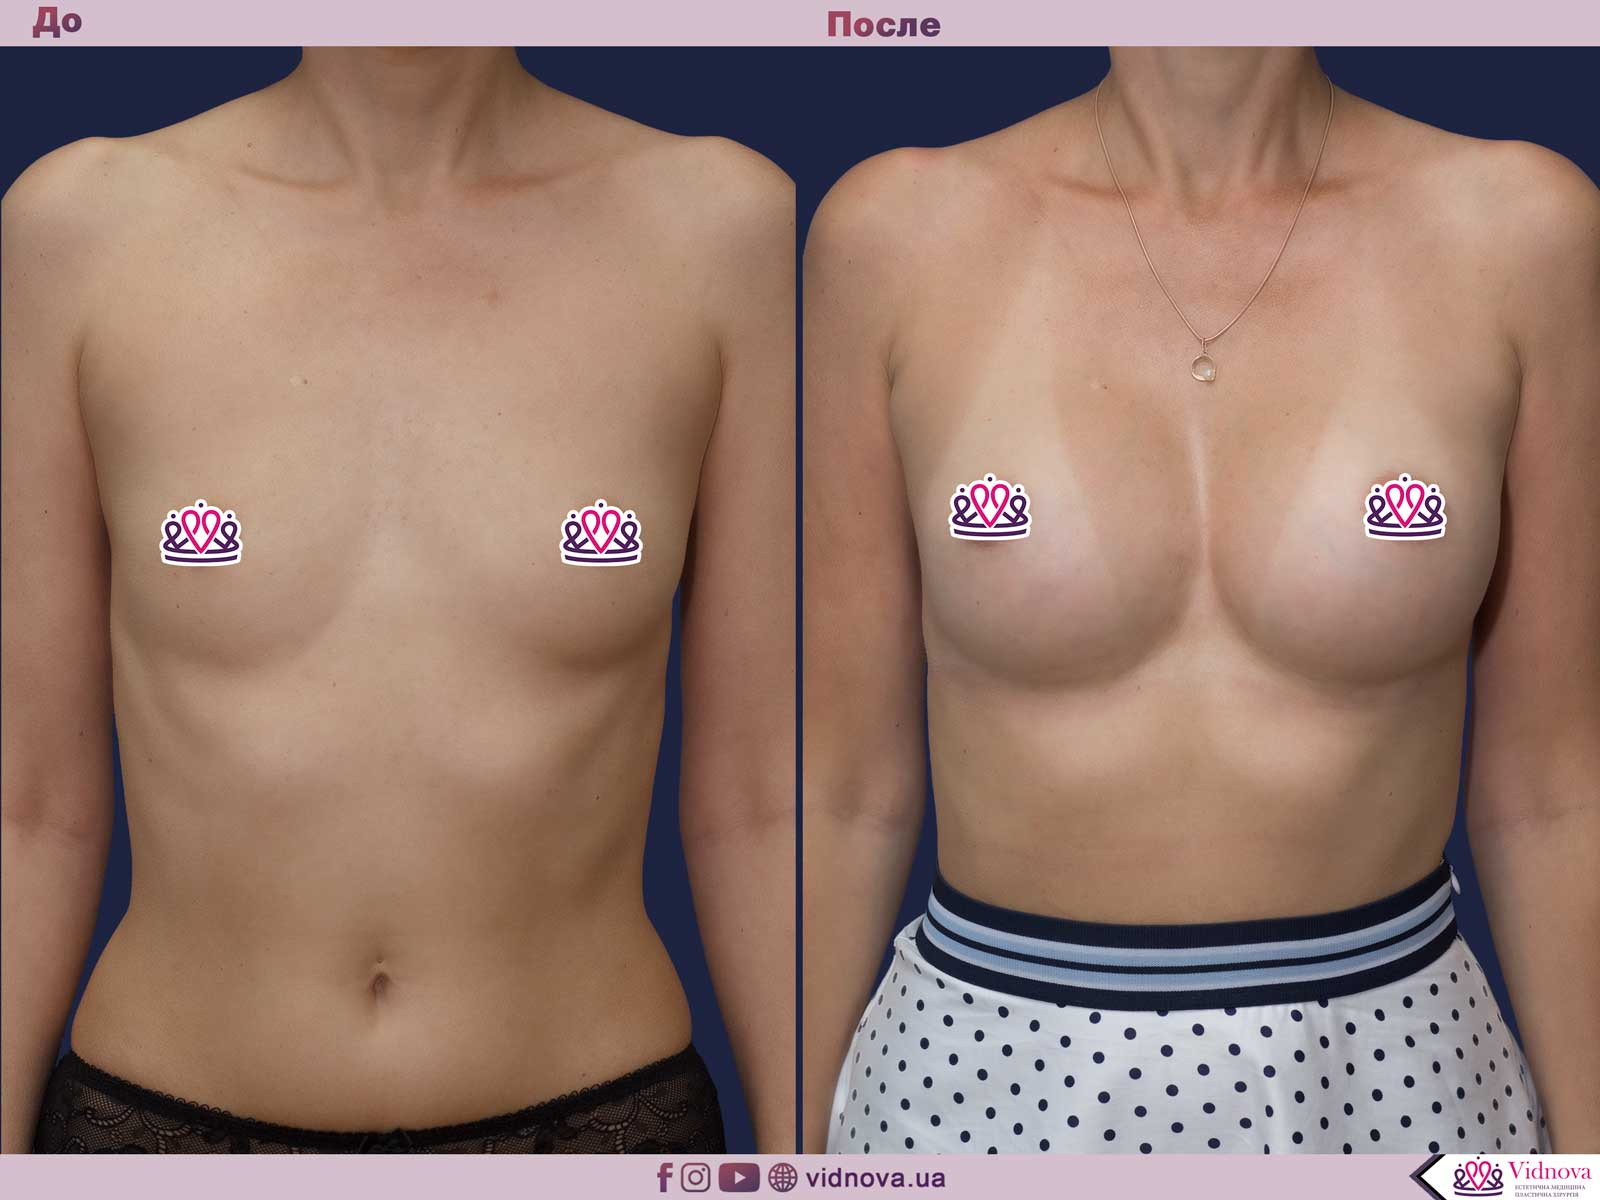 Увеличение груди: Фото ДО и ПОСЛЕ - Пример №53-1 - Клиника Vidnova